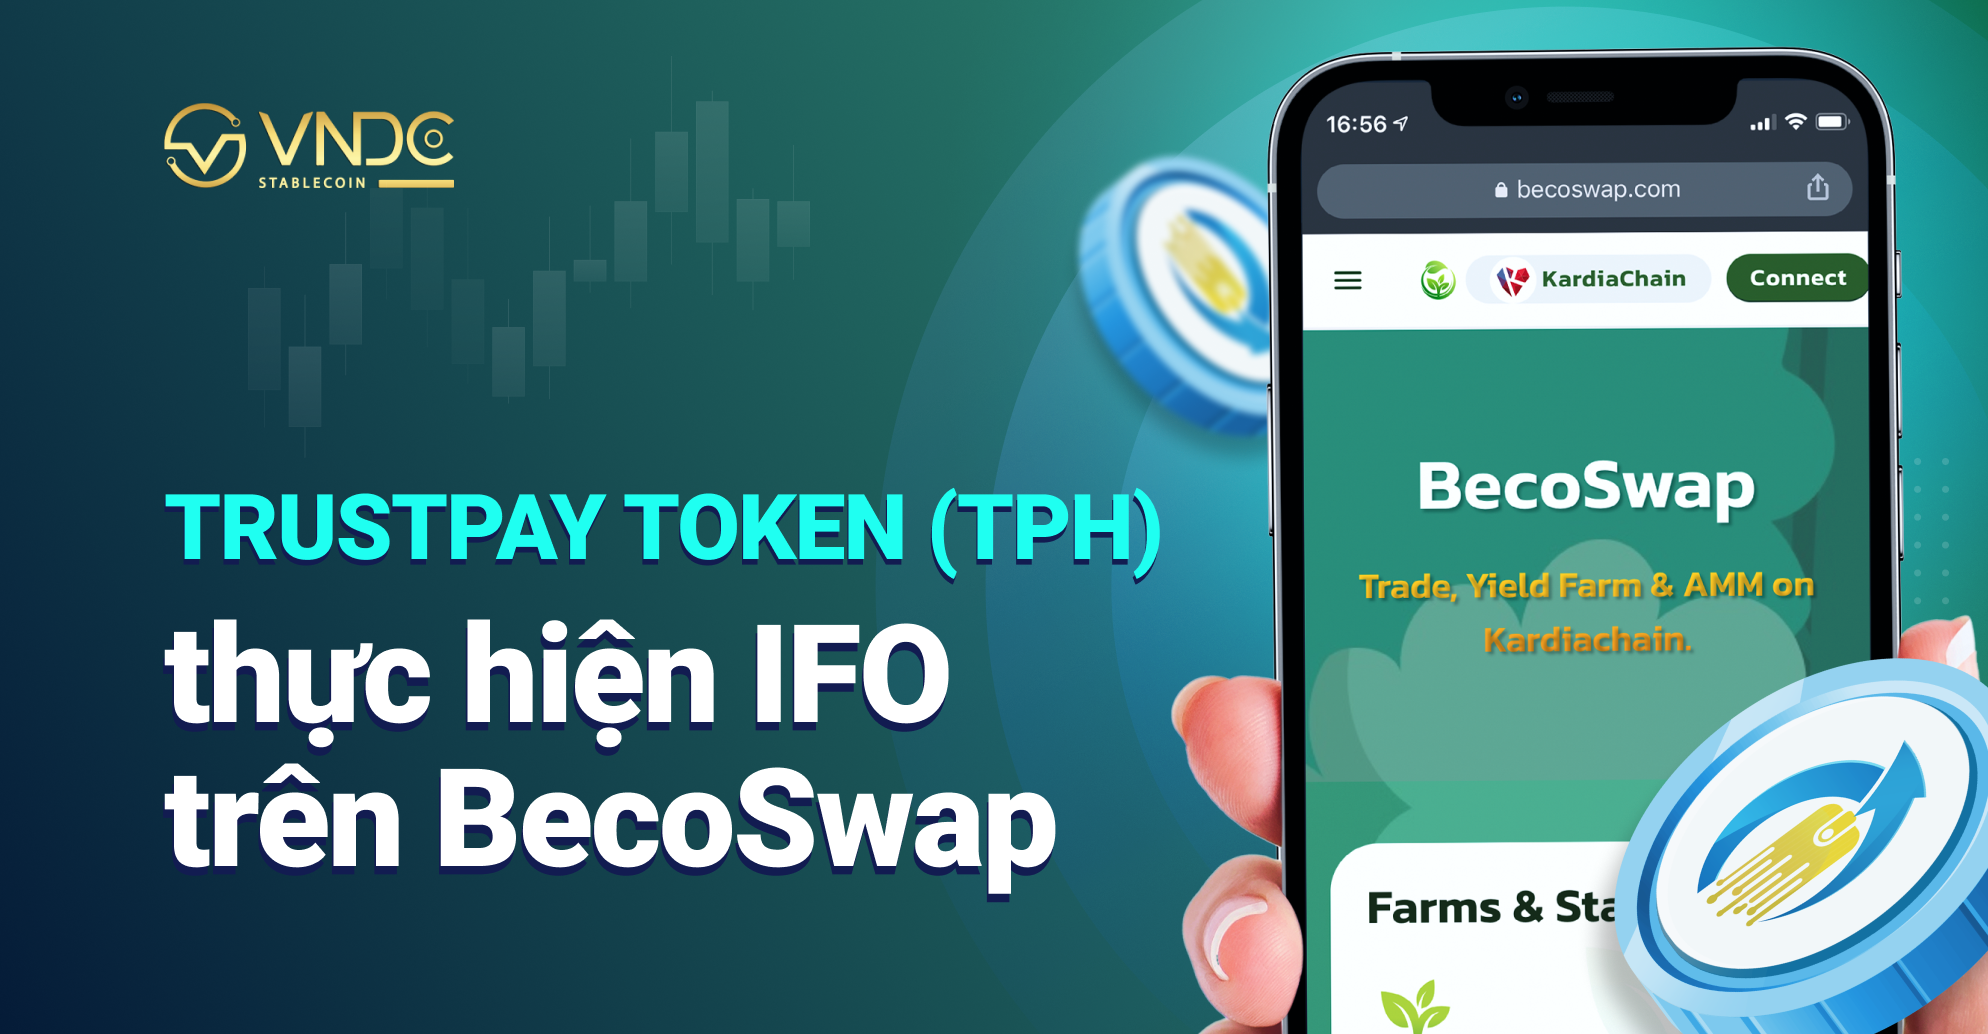 TRUSTpay token (TPH) thực hiện IFO trên BecoSwap